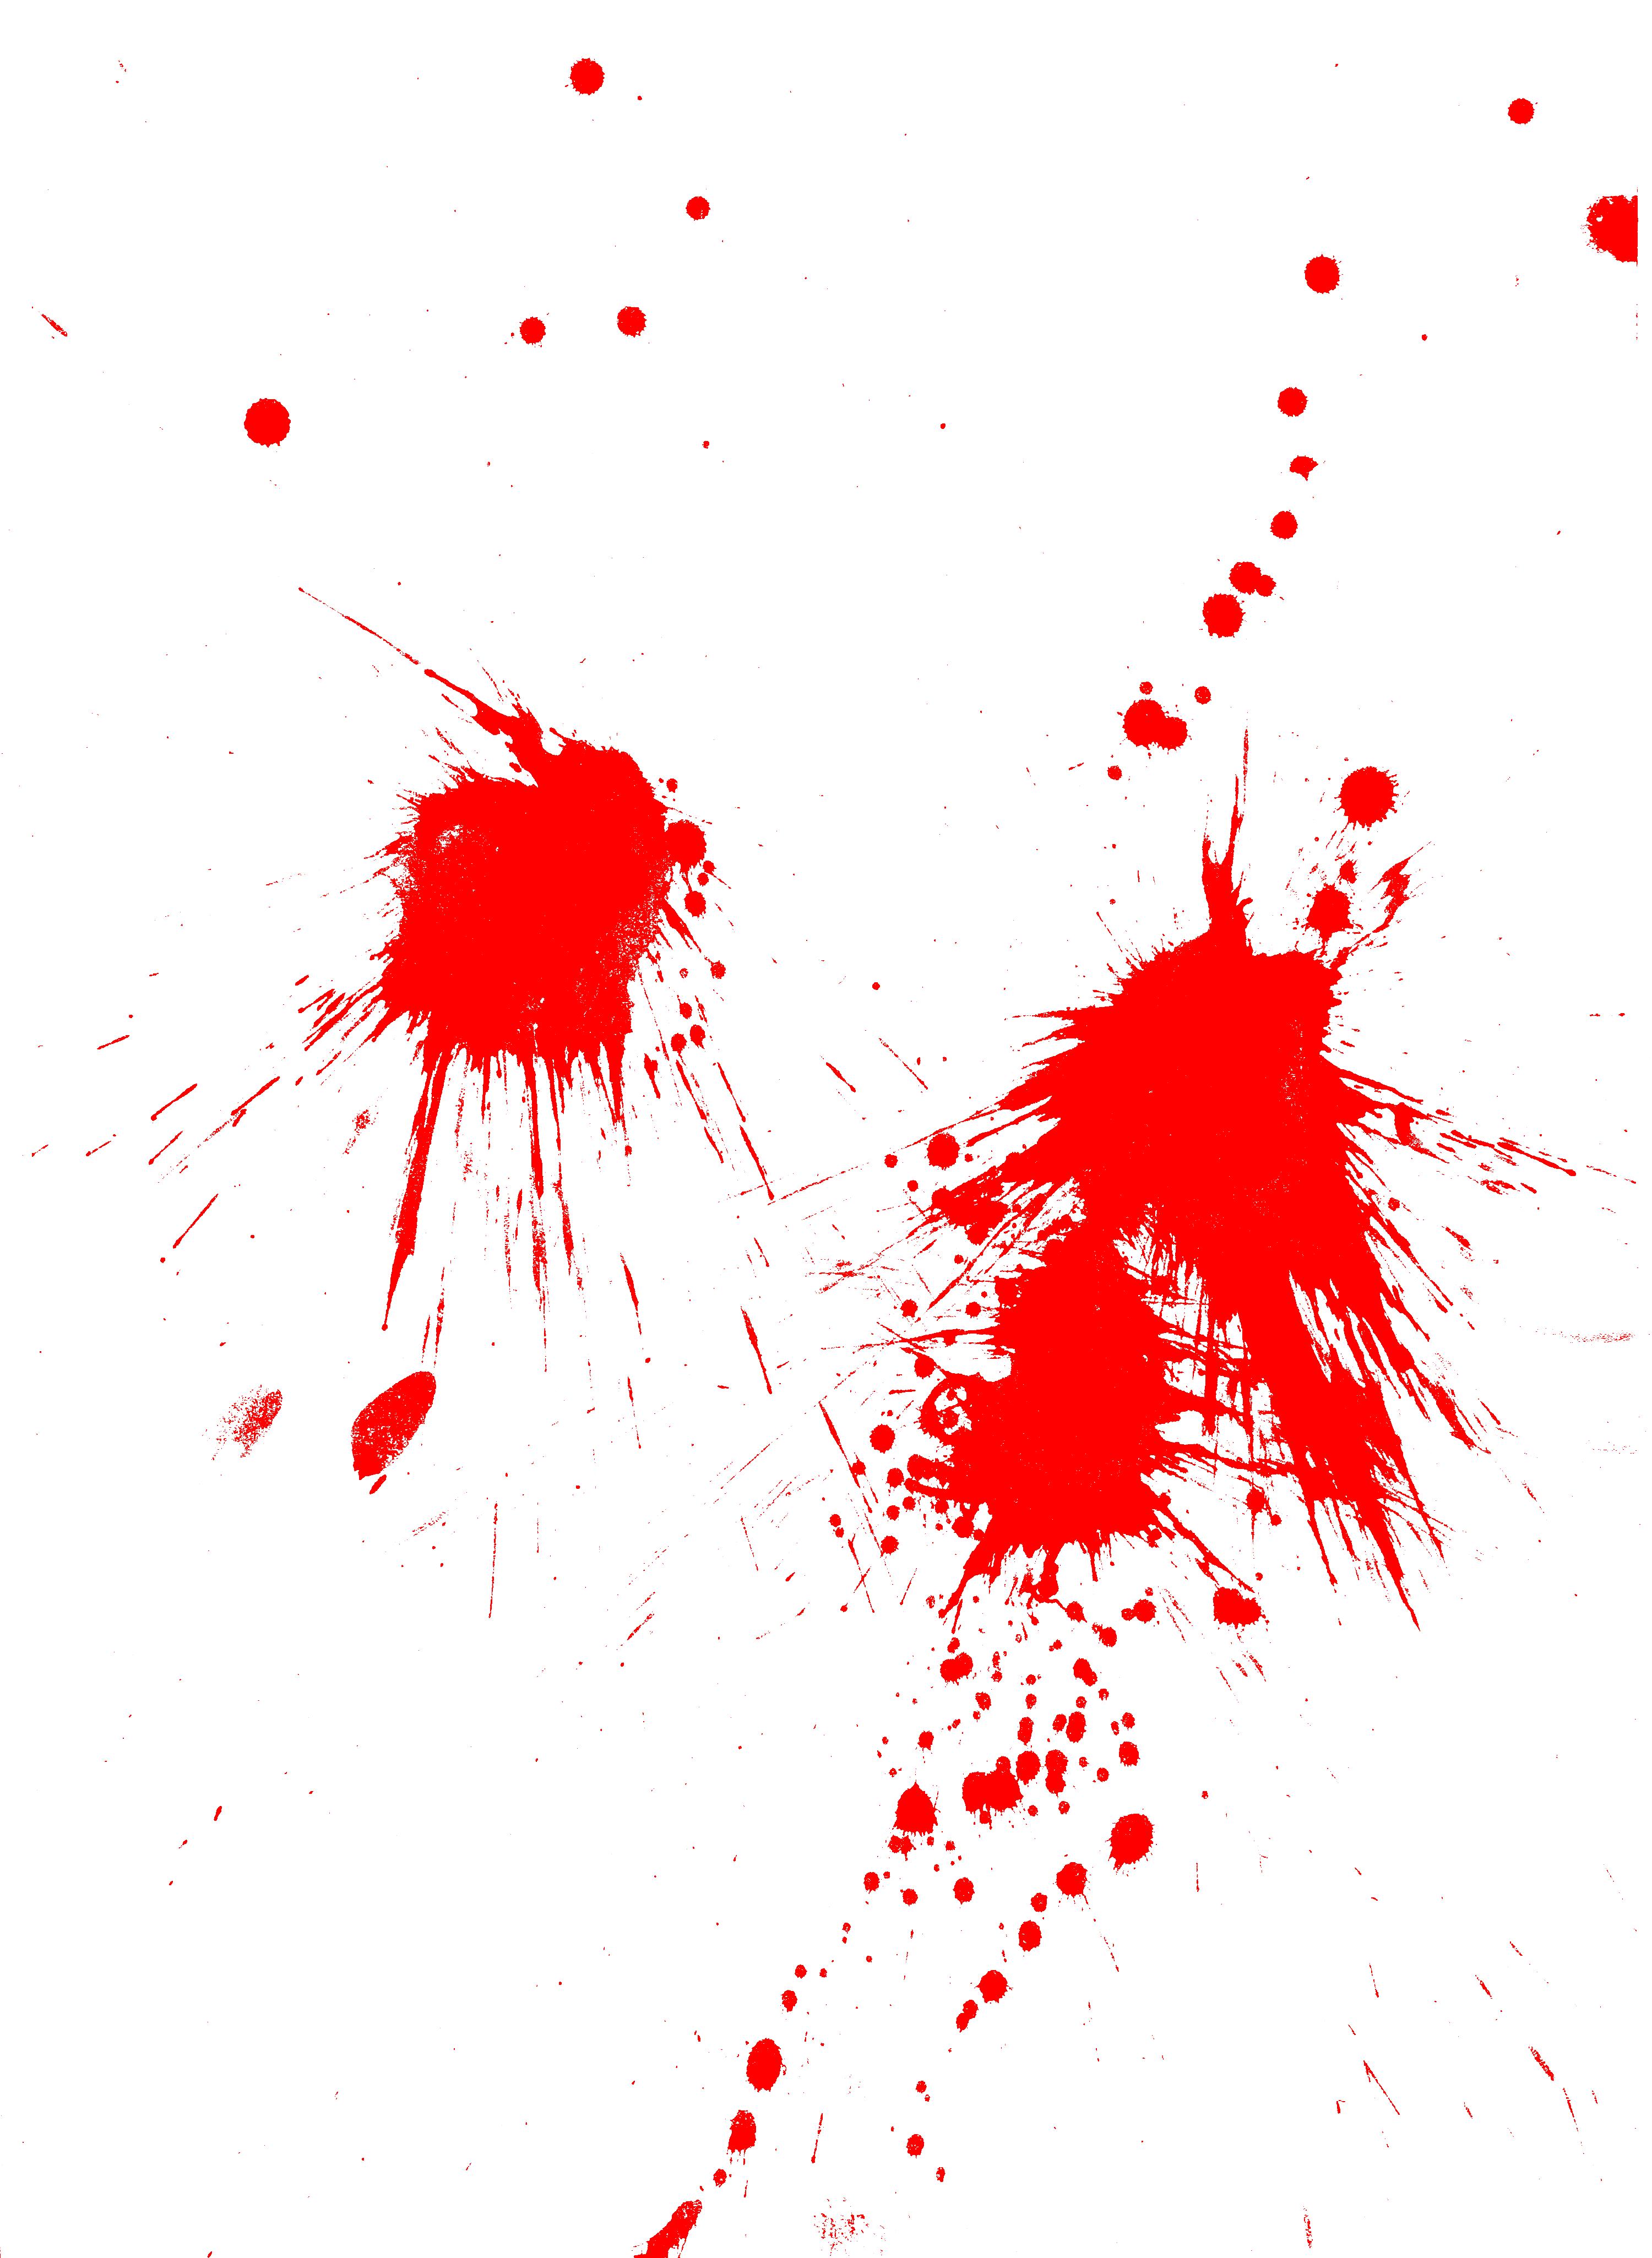 15 Blood Splatter Textures Jpg Onlygfx Com ✓ free for commercial use ✓ high quality images. 15 blood splatter textures jpg